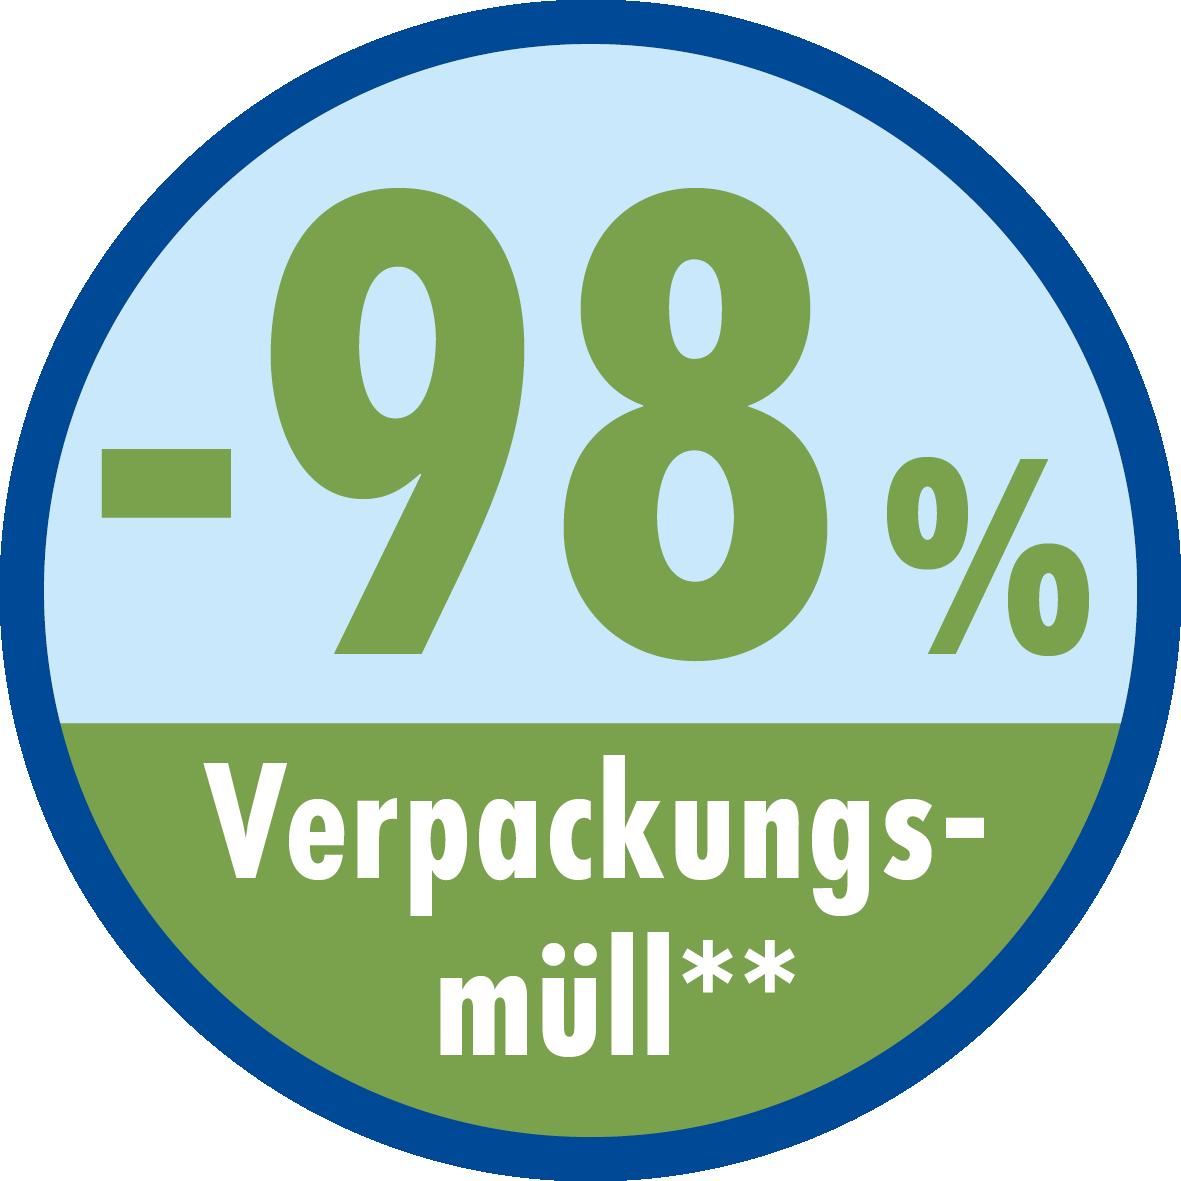 -98% verpakkingsafval